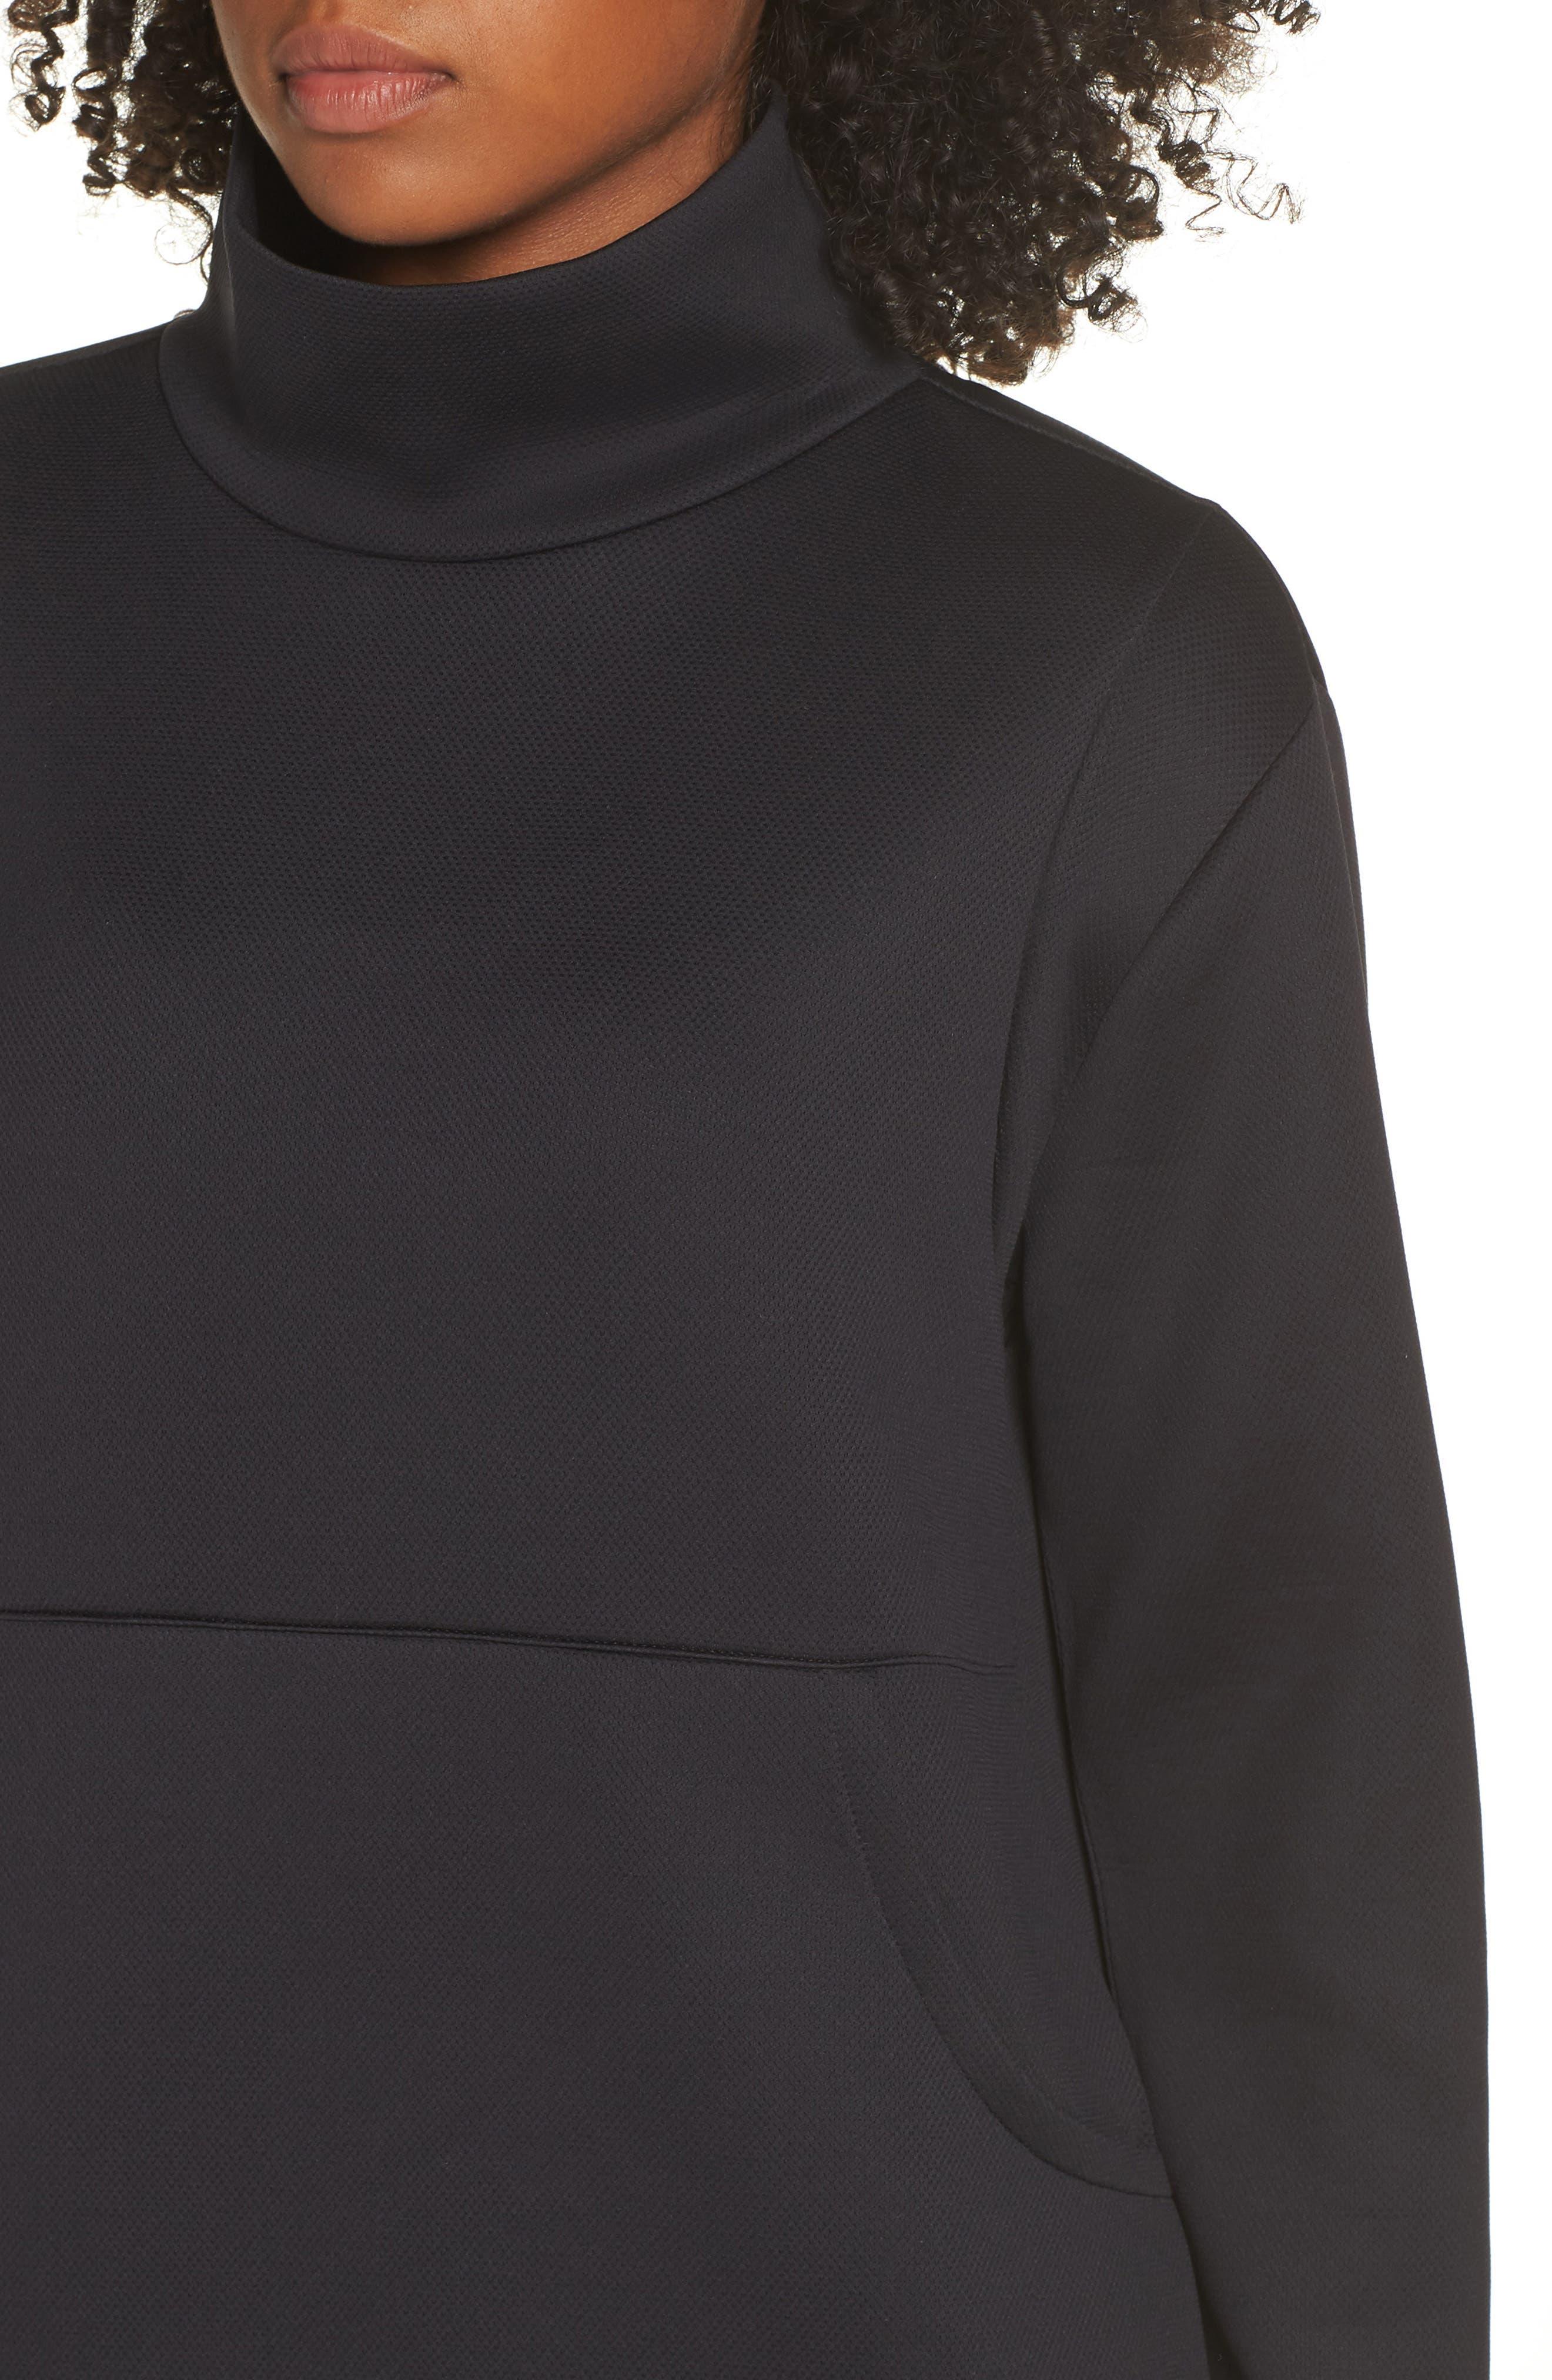 All About It Funnel Neck Sweatshirt,                             Alternate thumbnail 4, color,                             BLACK